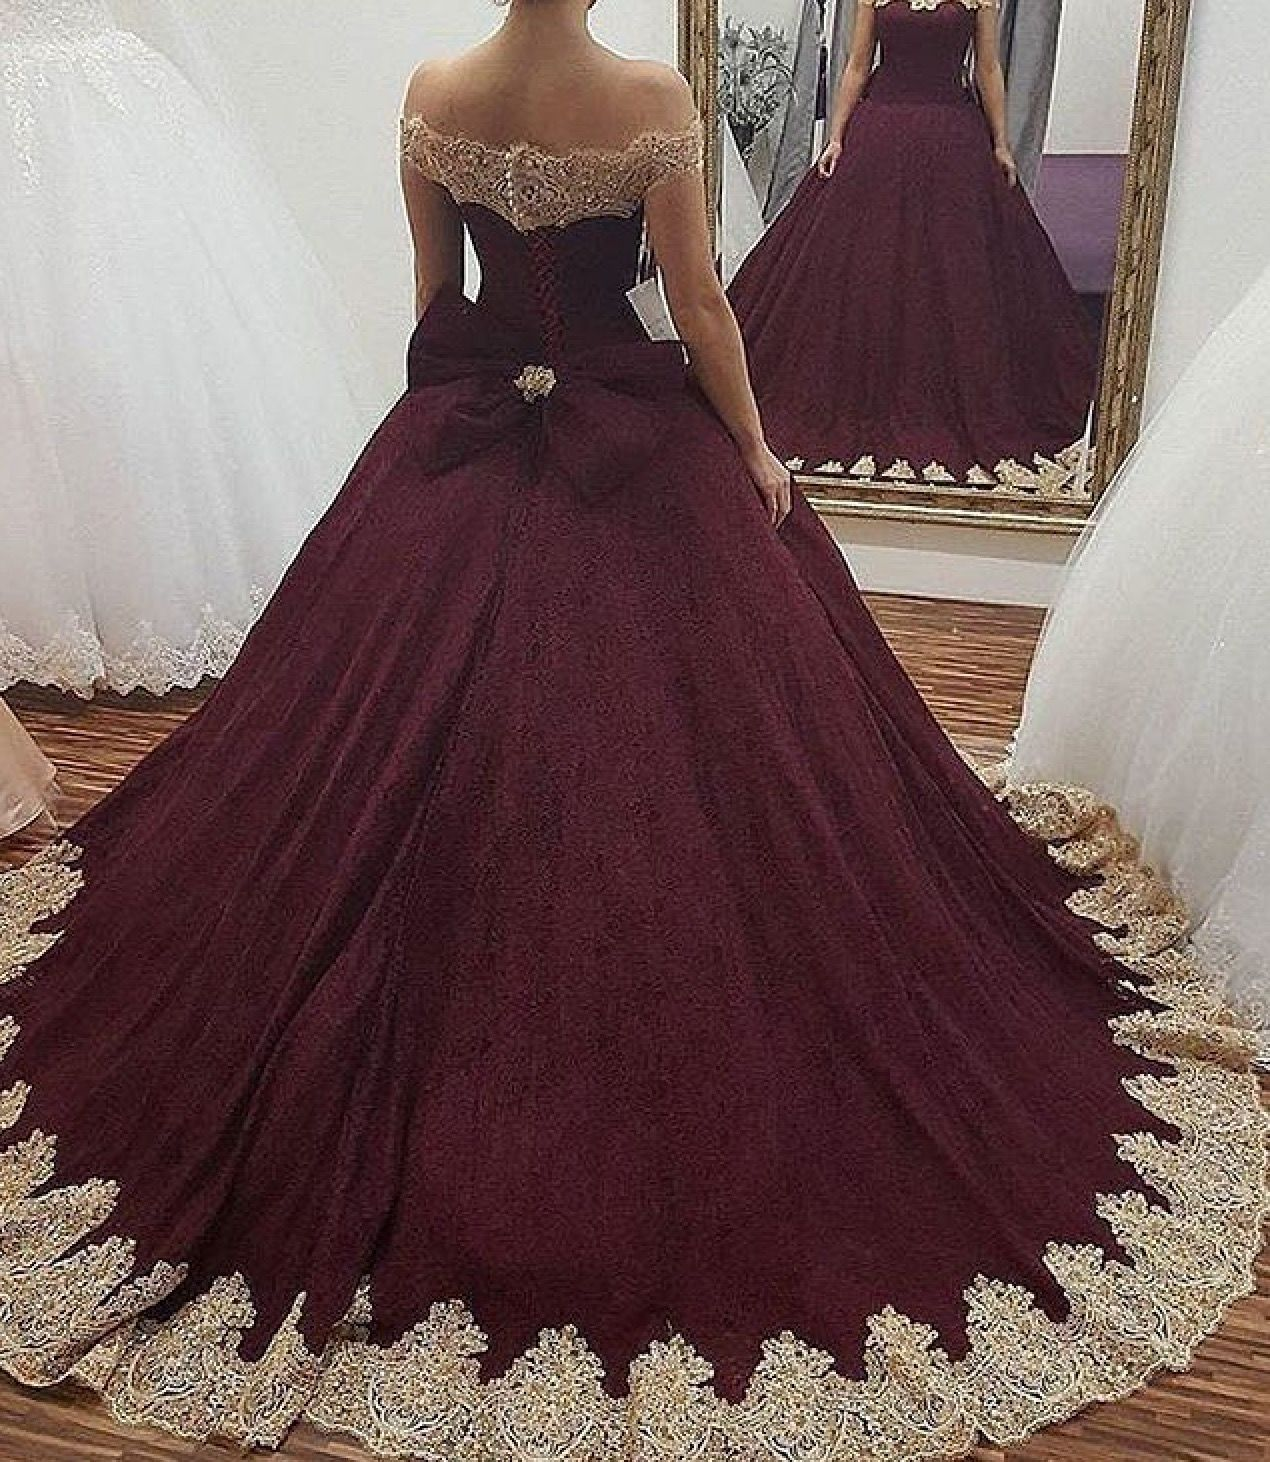 Pin De Kristen Lee En Ball Gown Dresses 15 Años Vestidos